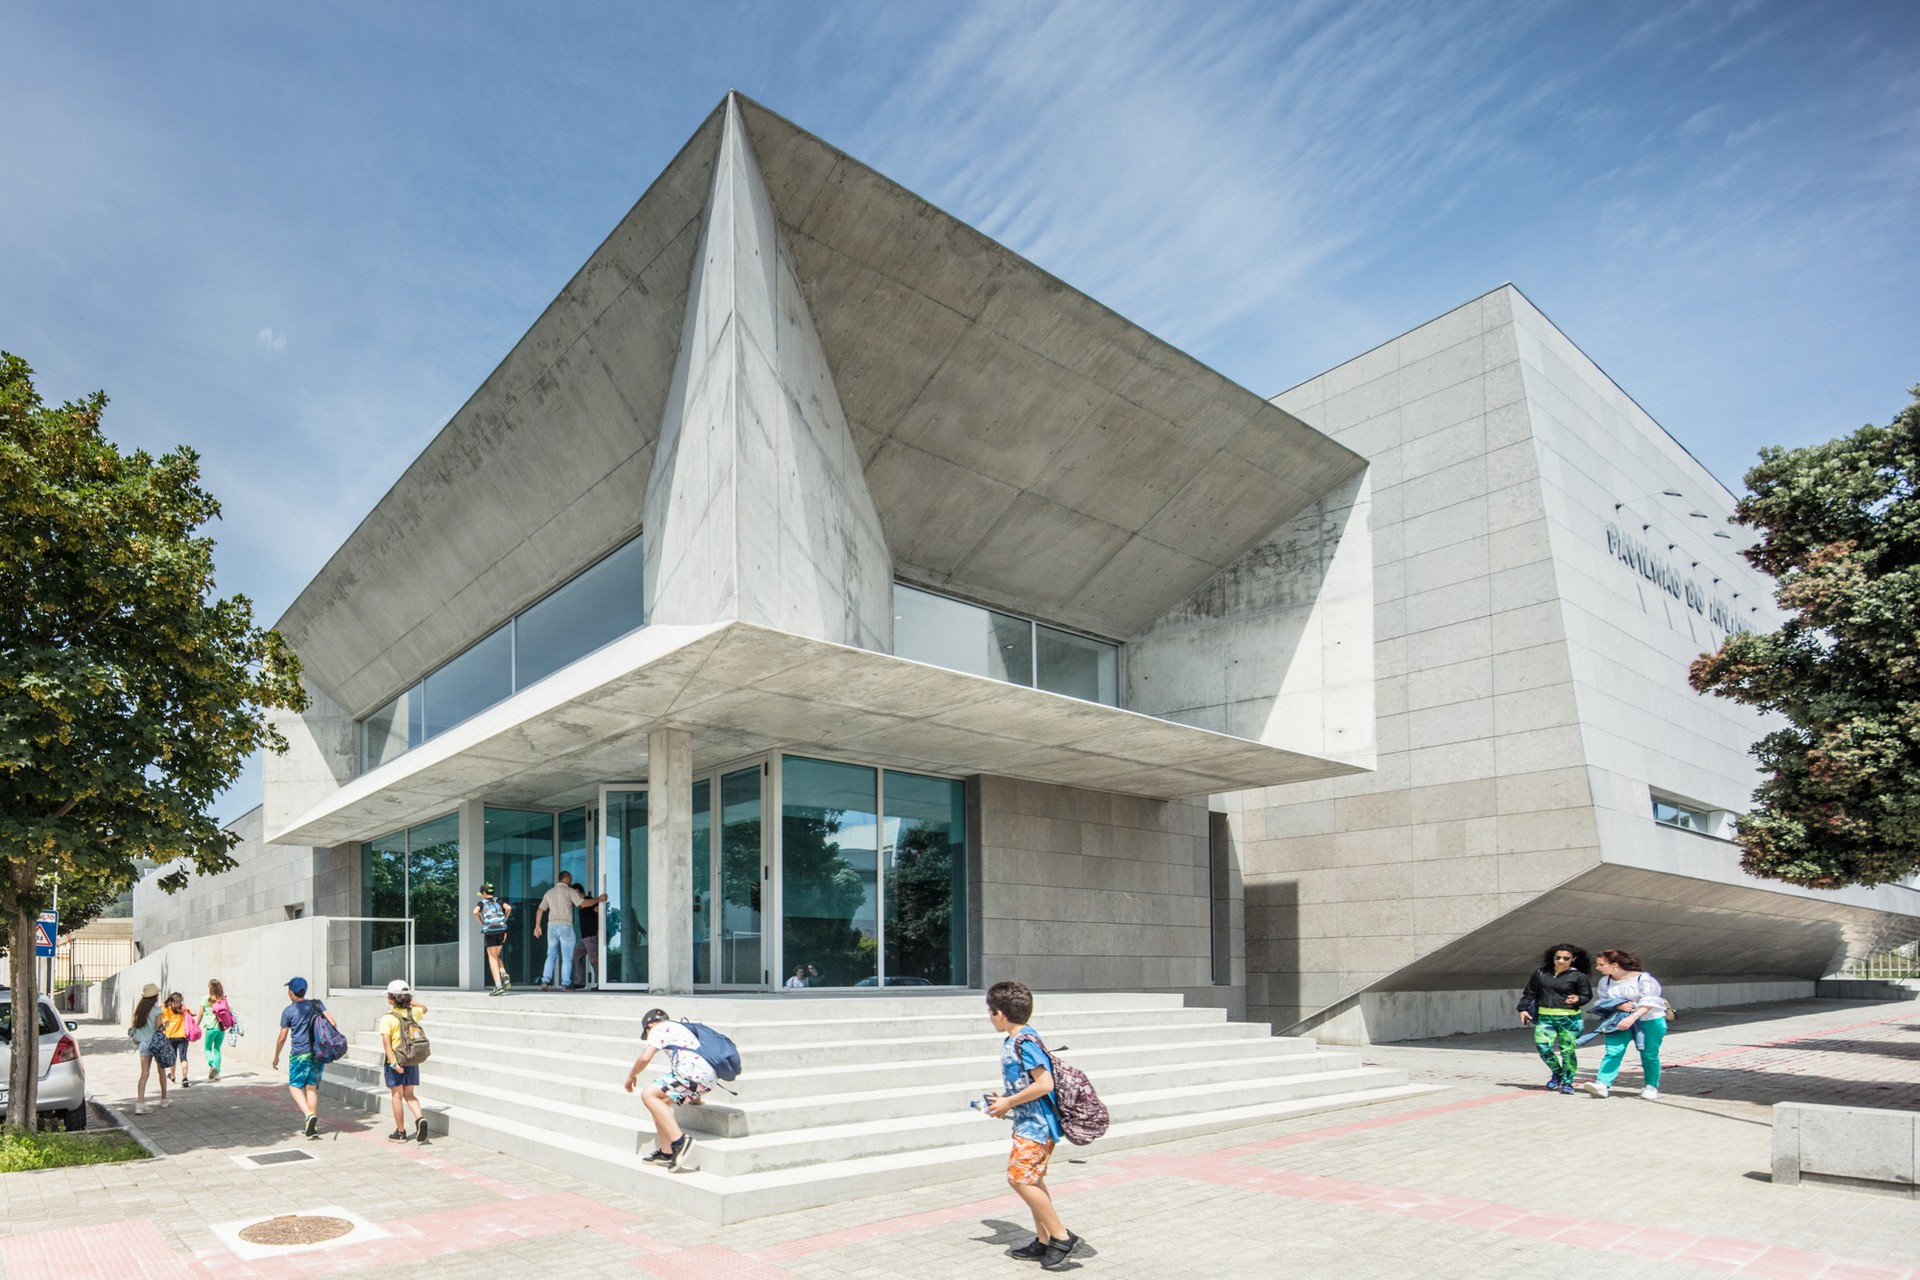 Portuguese Brutalist Architecture 5 portuguese brutalist architecture Portuguese Brutalist Architecture is presented in Atlantic Pavilion Portuguese Brutalist Architecture 5